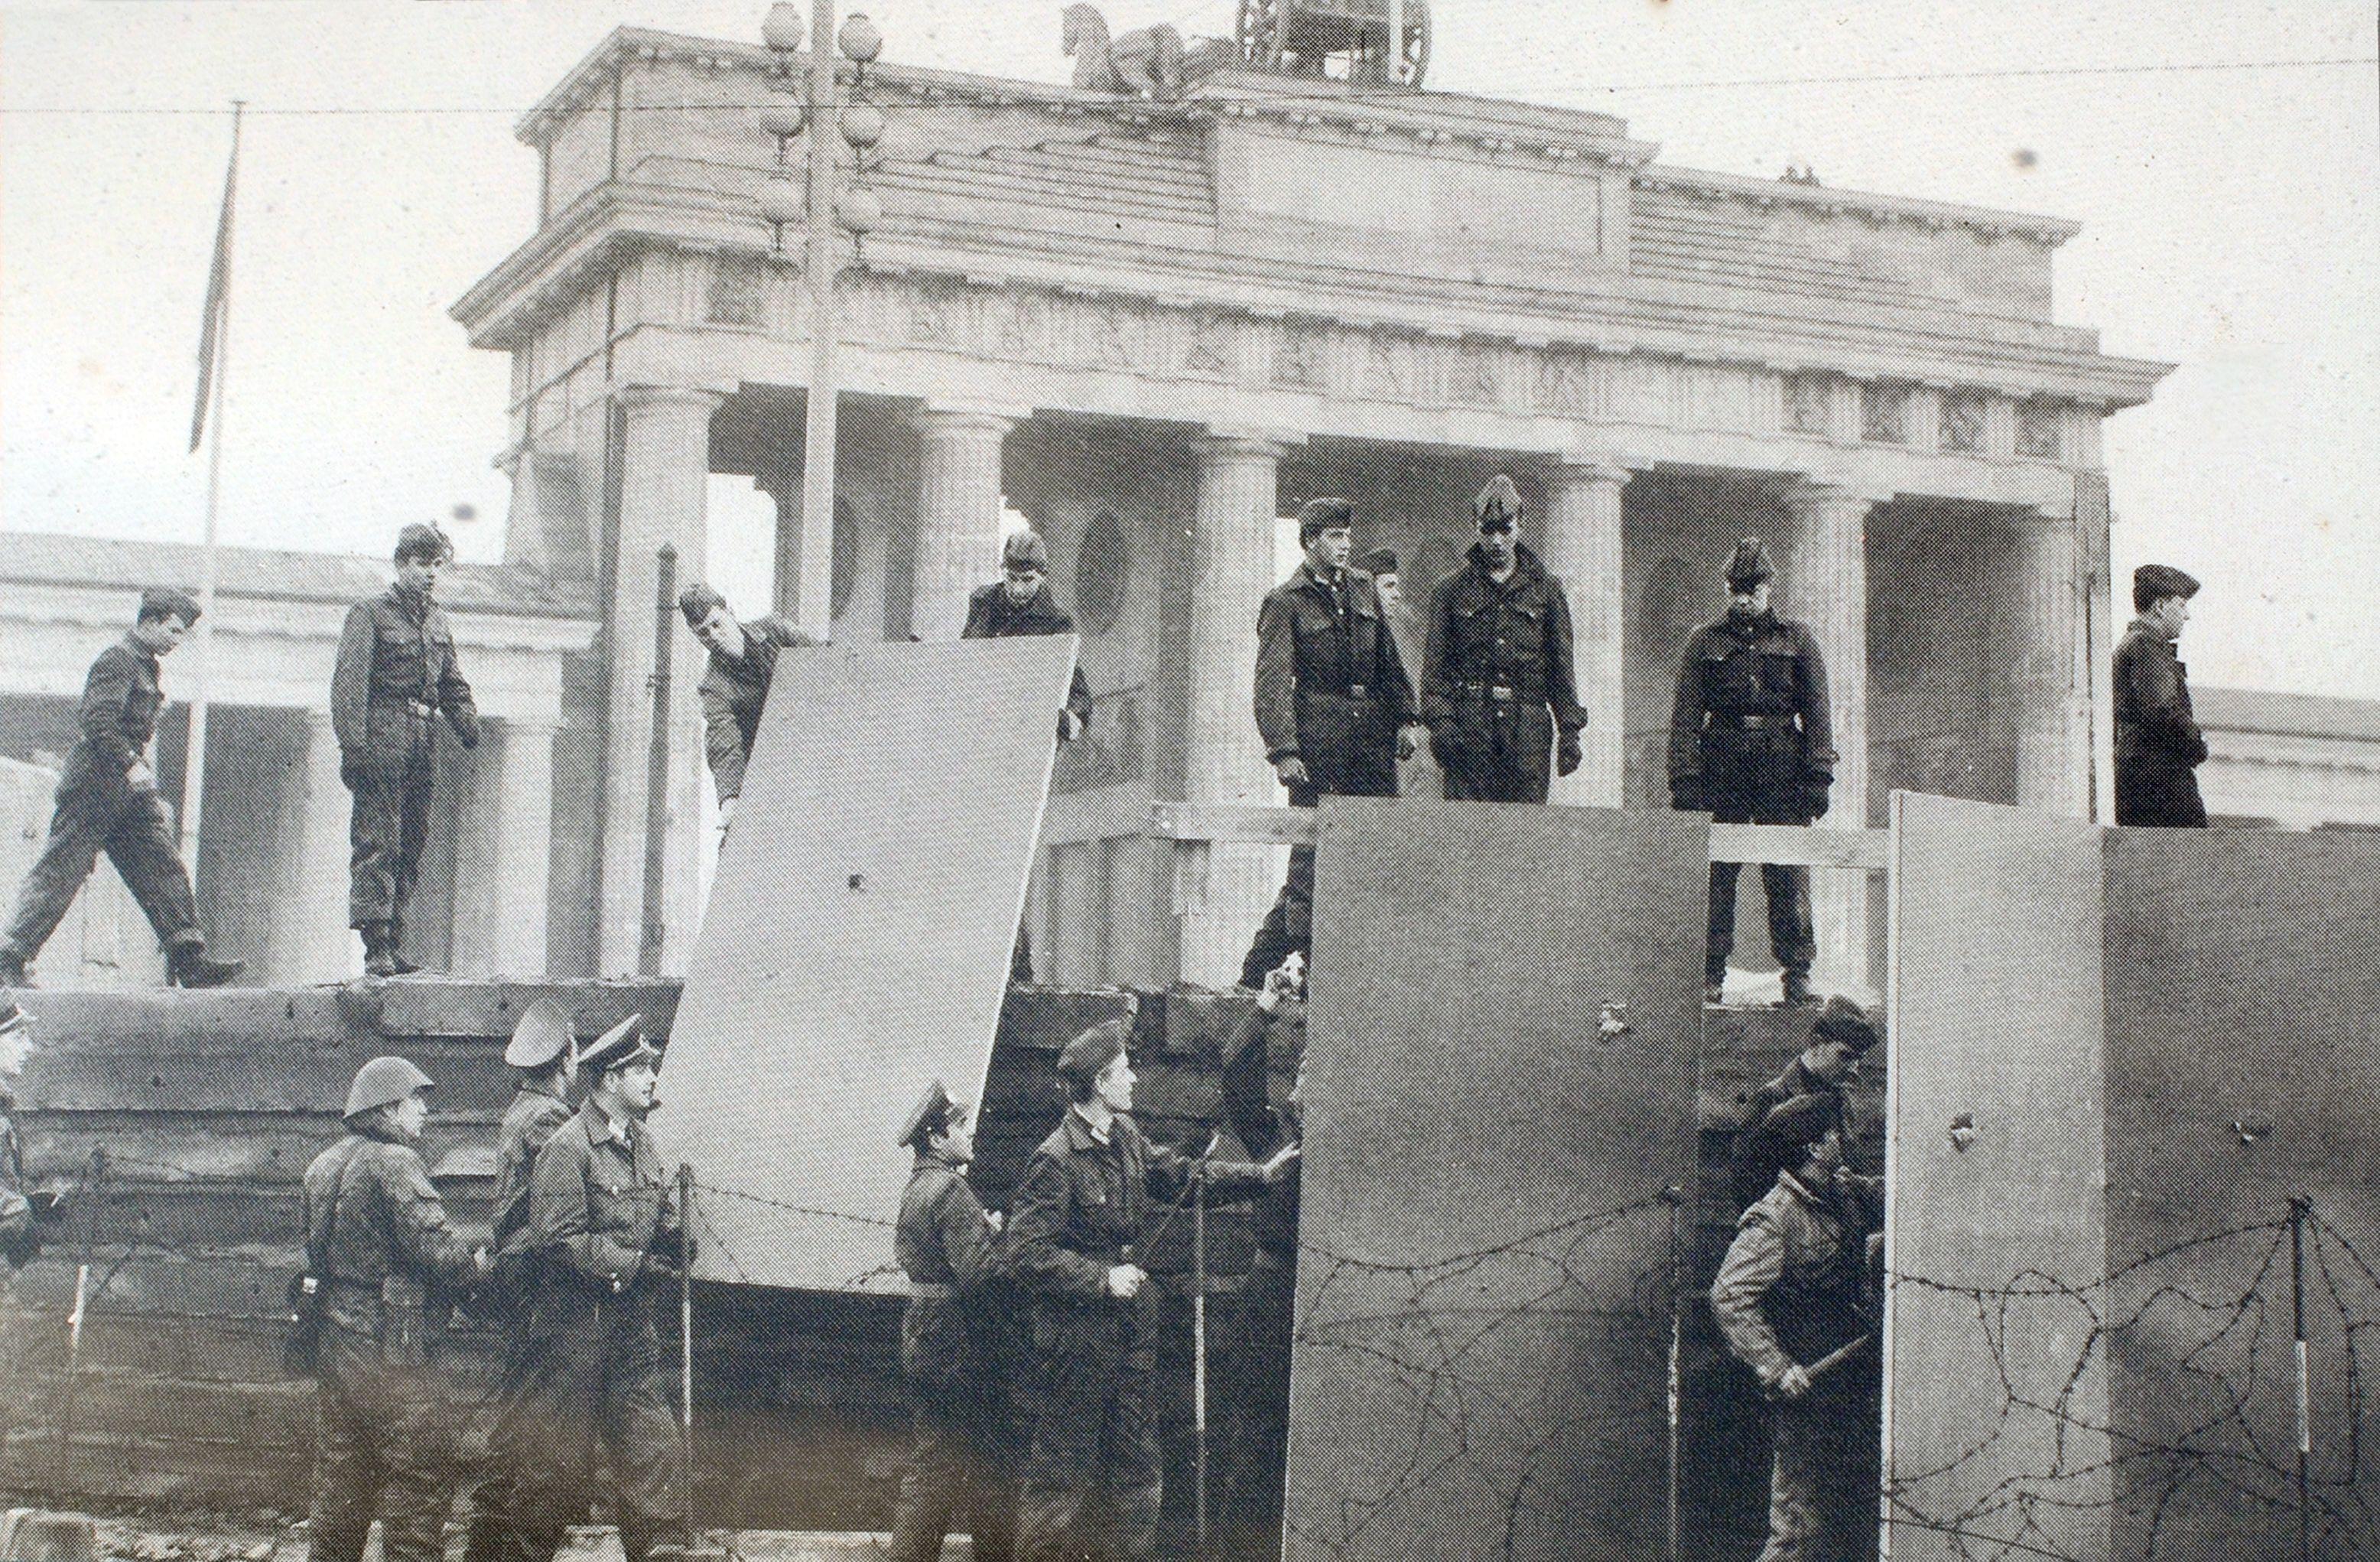 Bau Der Berliner Mauer Vor Dem Brandenburger Tor Berlin Wall Berlin Wonderful Places